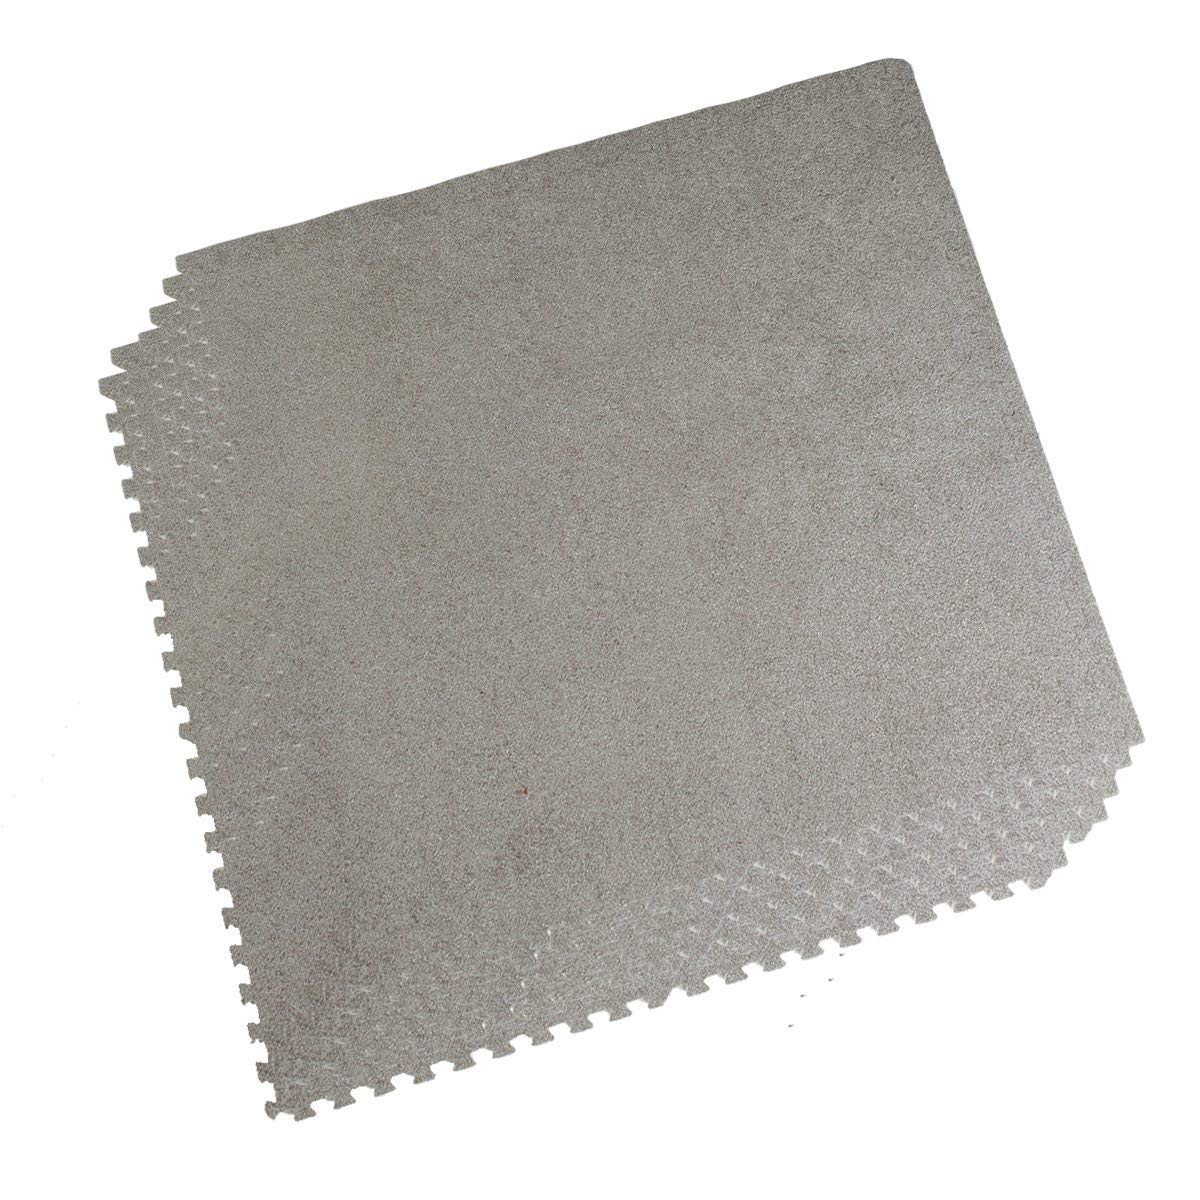 Cheap Floor Carpet Tiles Find Floor Carpet Tiles Deals On Line At